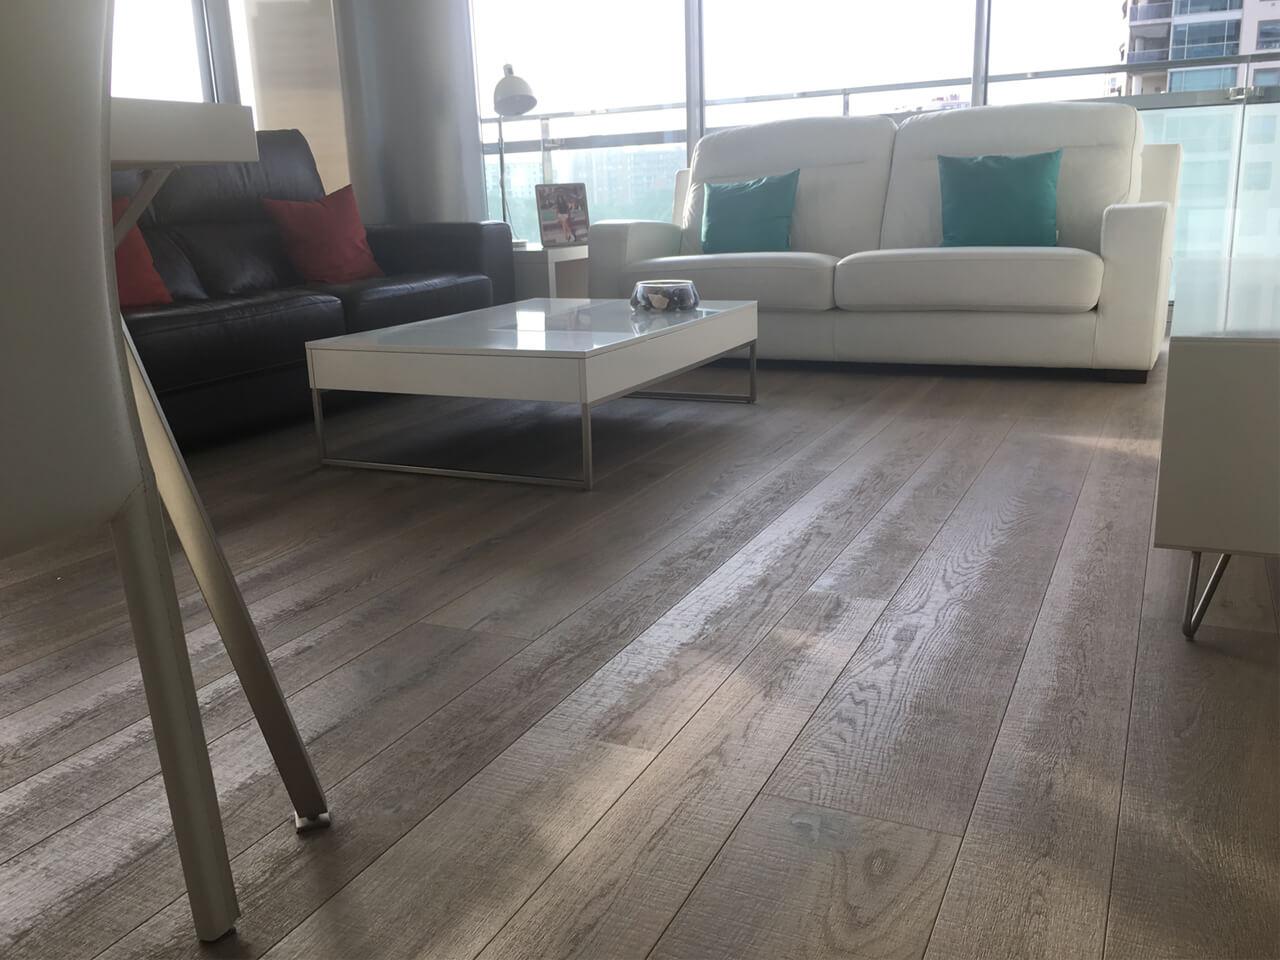 Moskito parquet Barcelona proyecto apartamento en Diagonal Mar sala de estar suelo roble